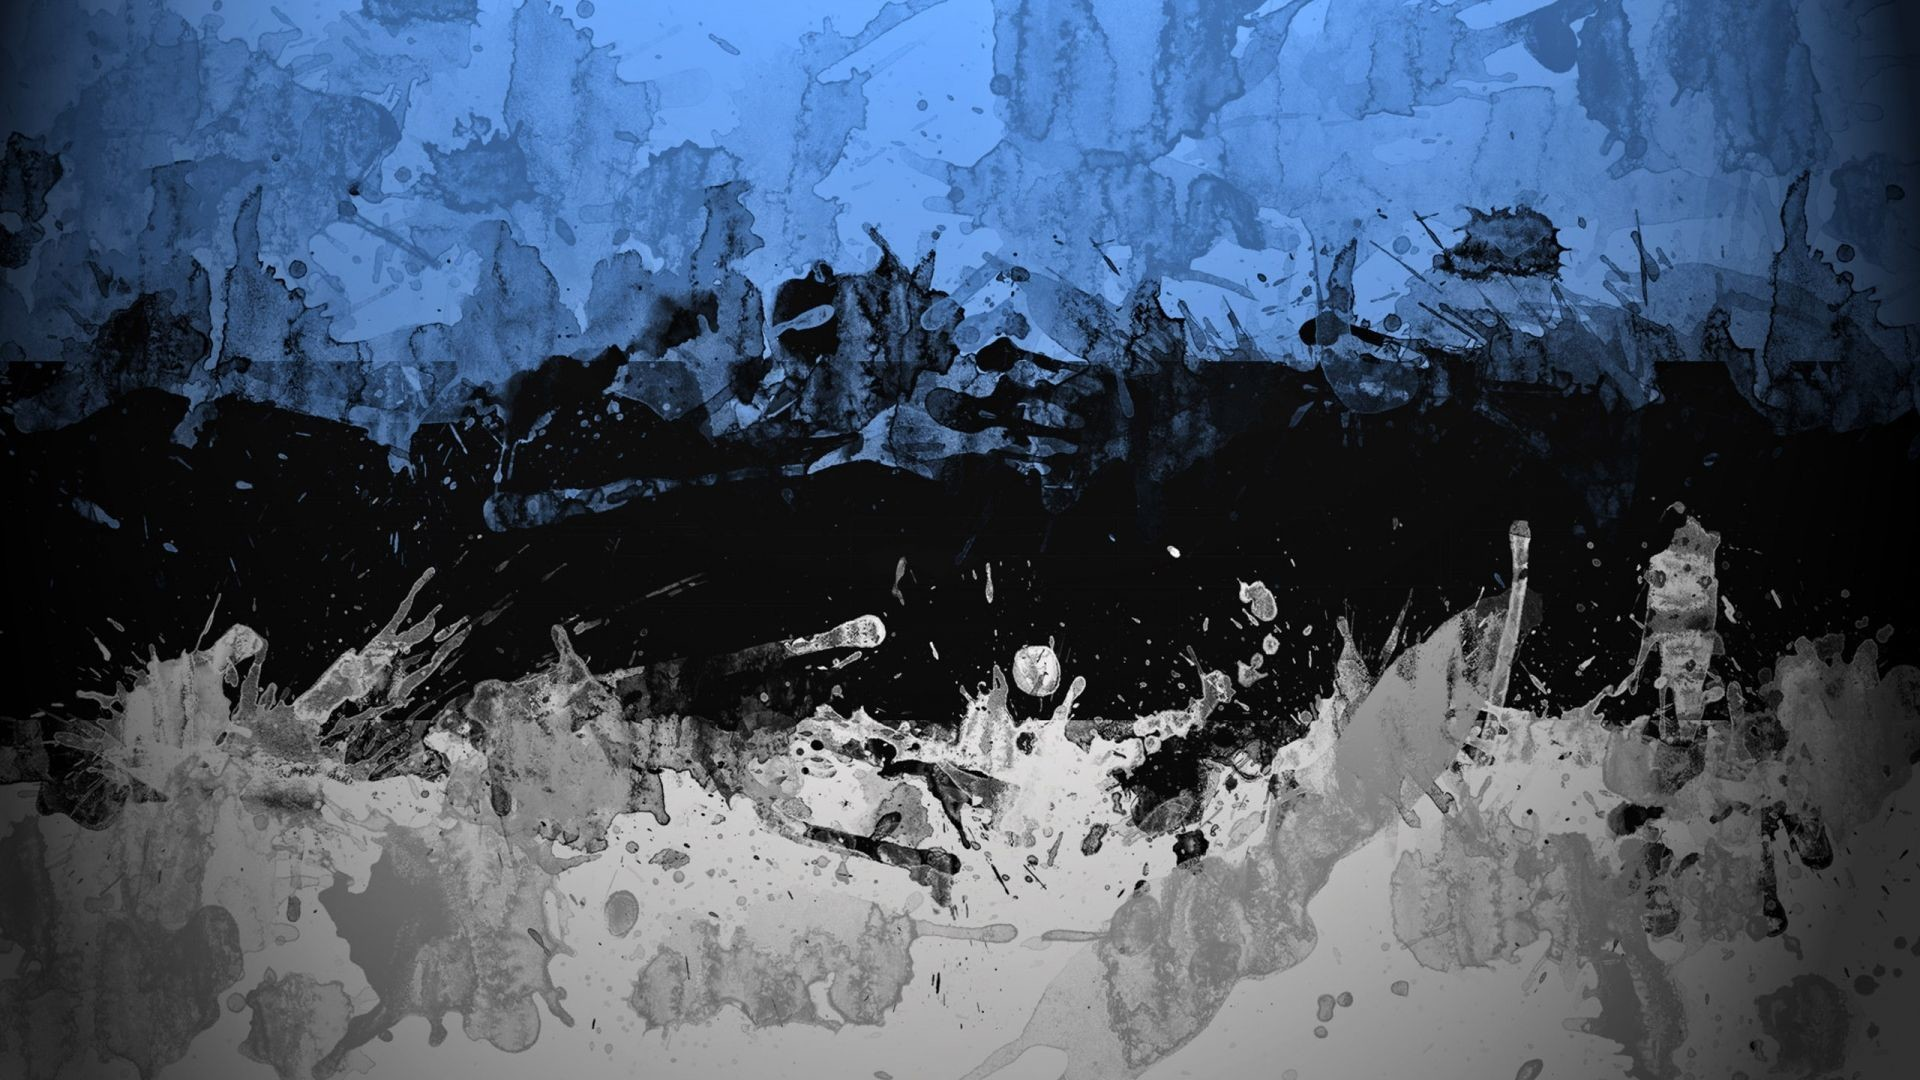 Abstract Wallpaper Dark HD 1080P #80 Wallpaper